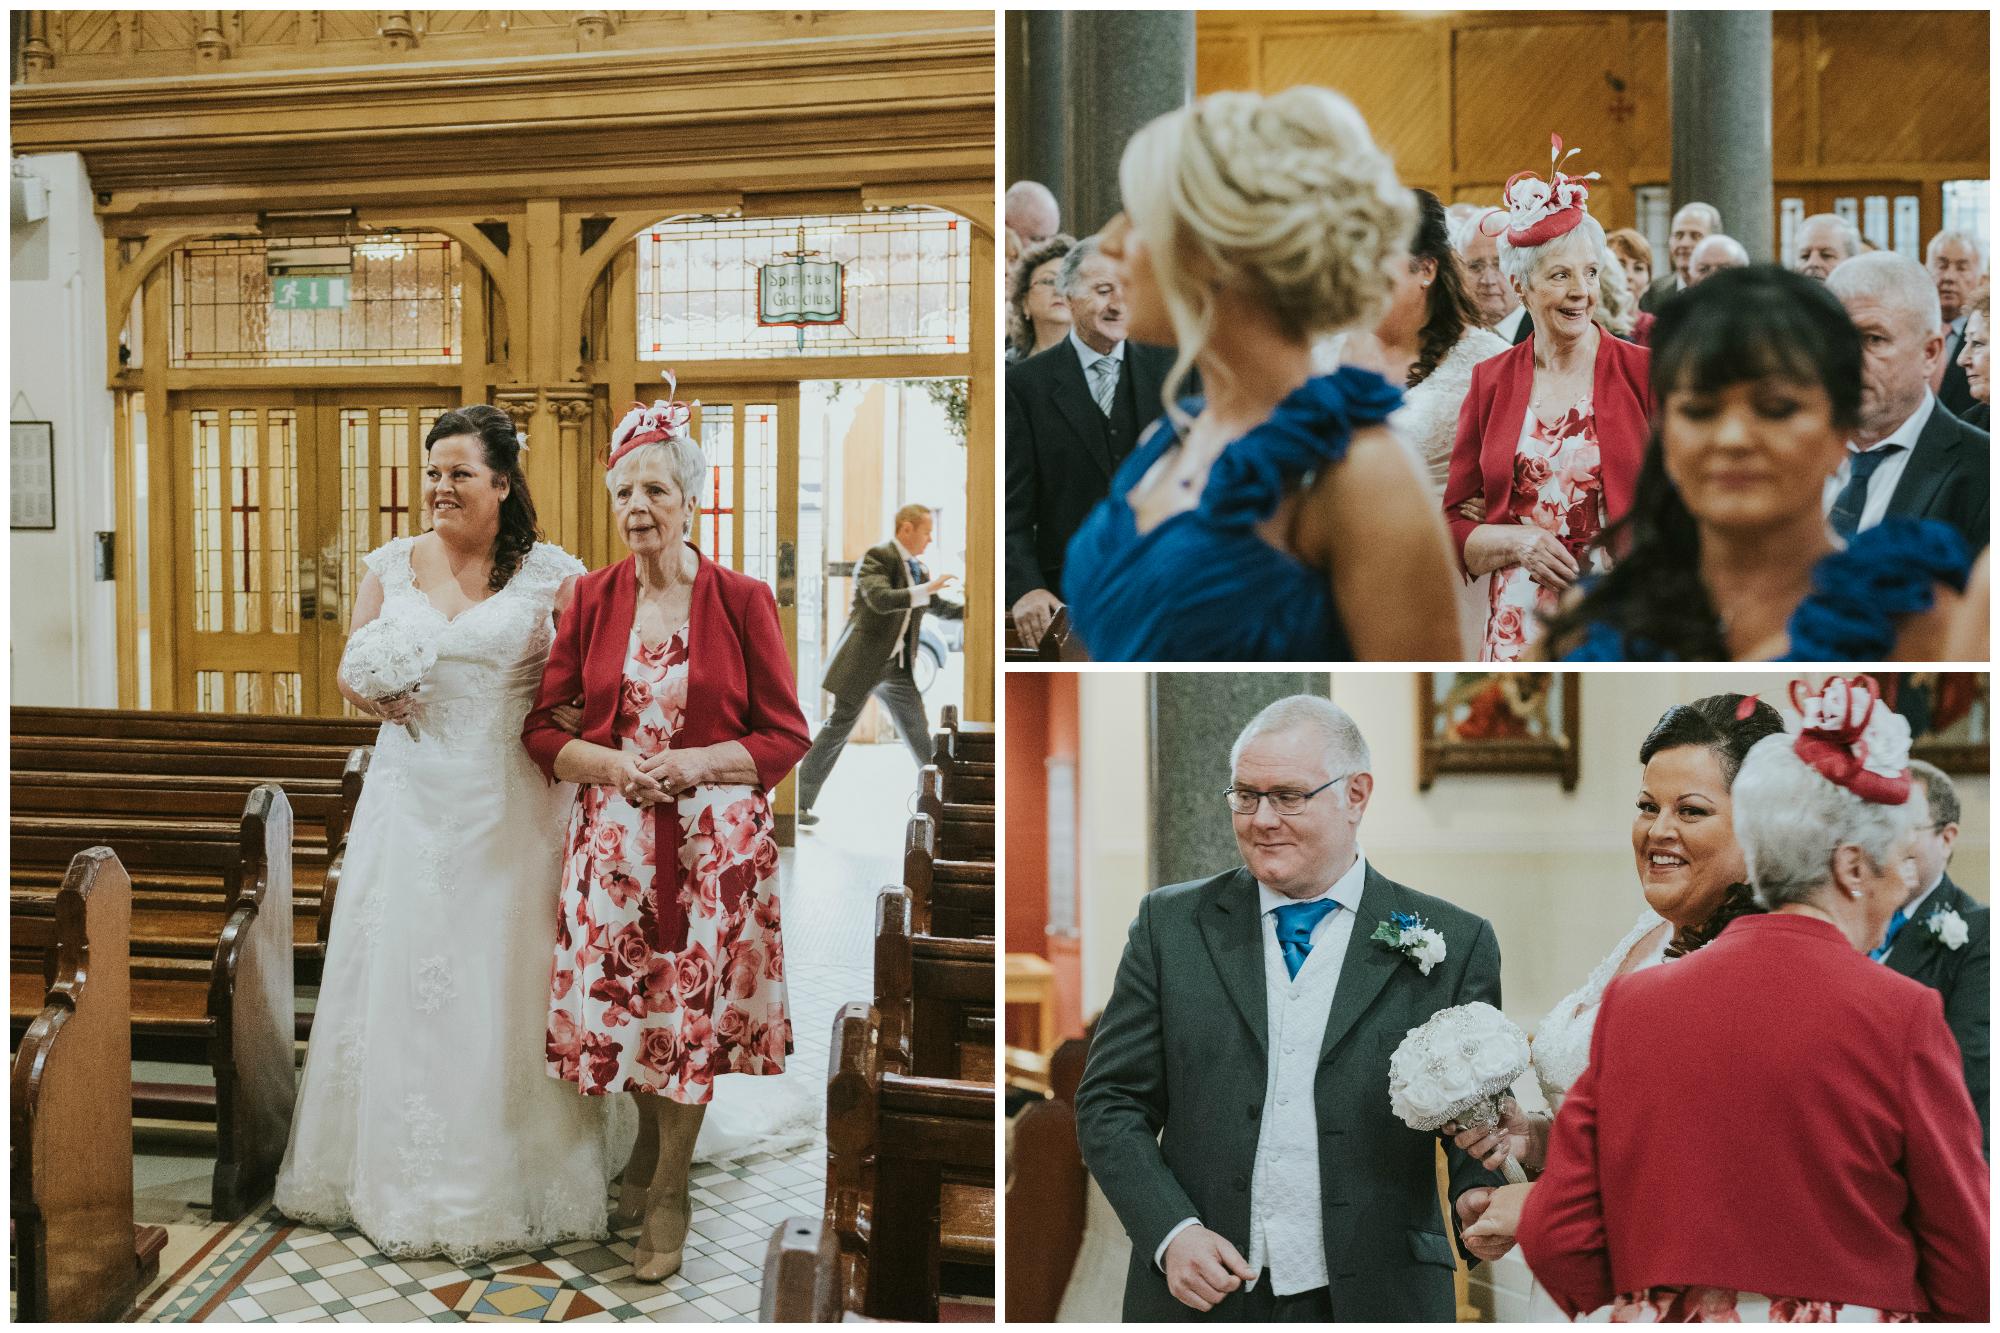 St. Pauls belfast wedding photographer pure photo n.i bride arrival